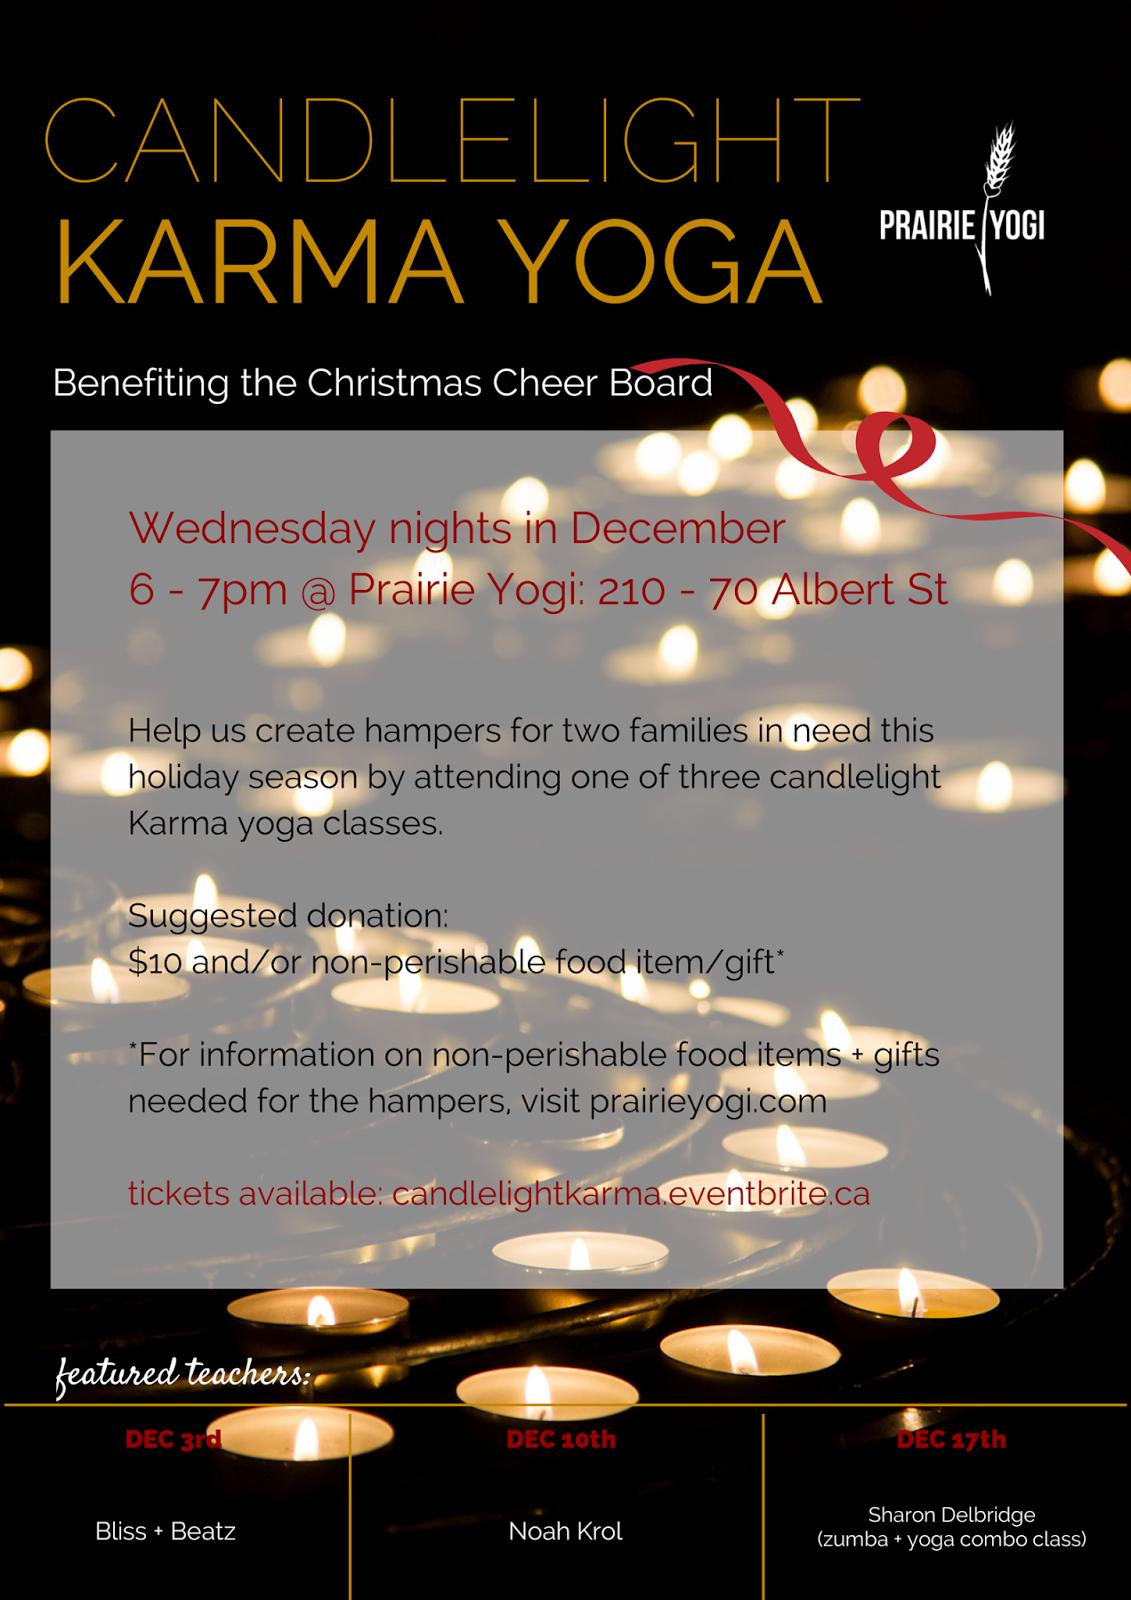 candlelight yoga, Christmas yoga, karma yoga winnipeg, Noah Krol, Popup prana, prairie yogi, Sharon Delbridge, spread good cheer, bliss and beatz, Winnipeg christmas cheer, Winnipeg Yoga